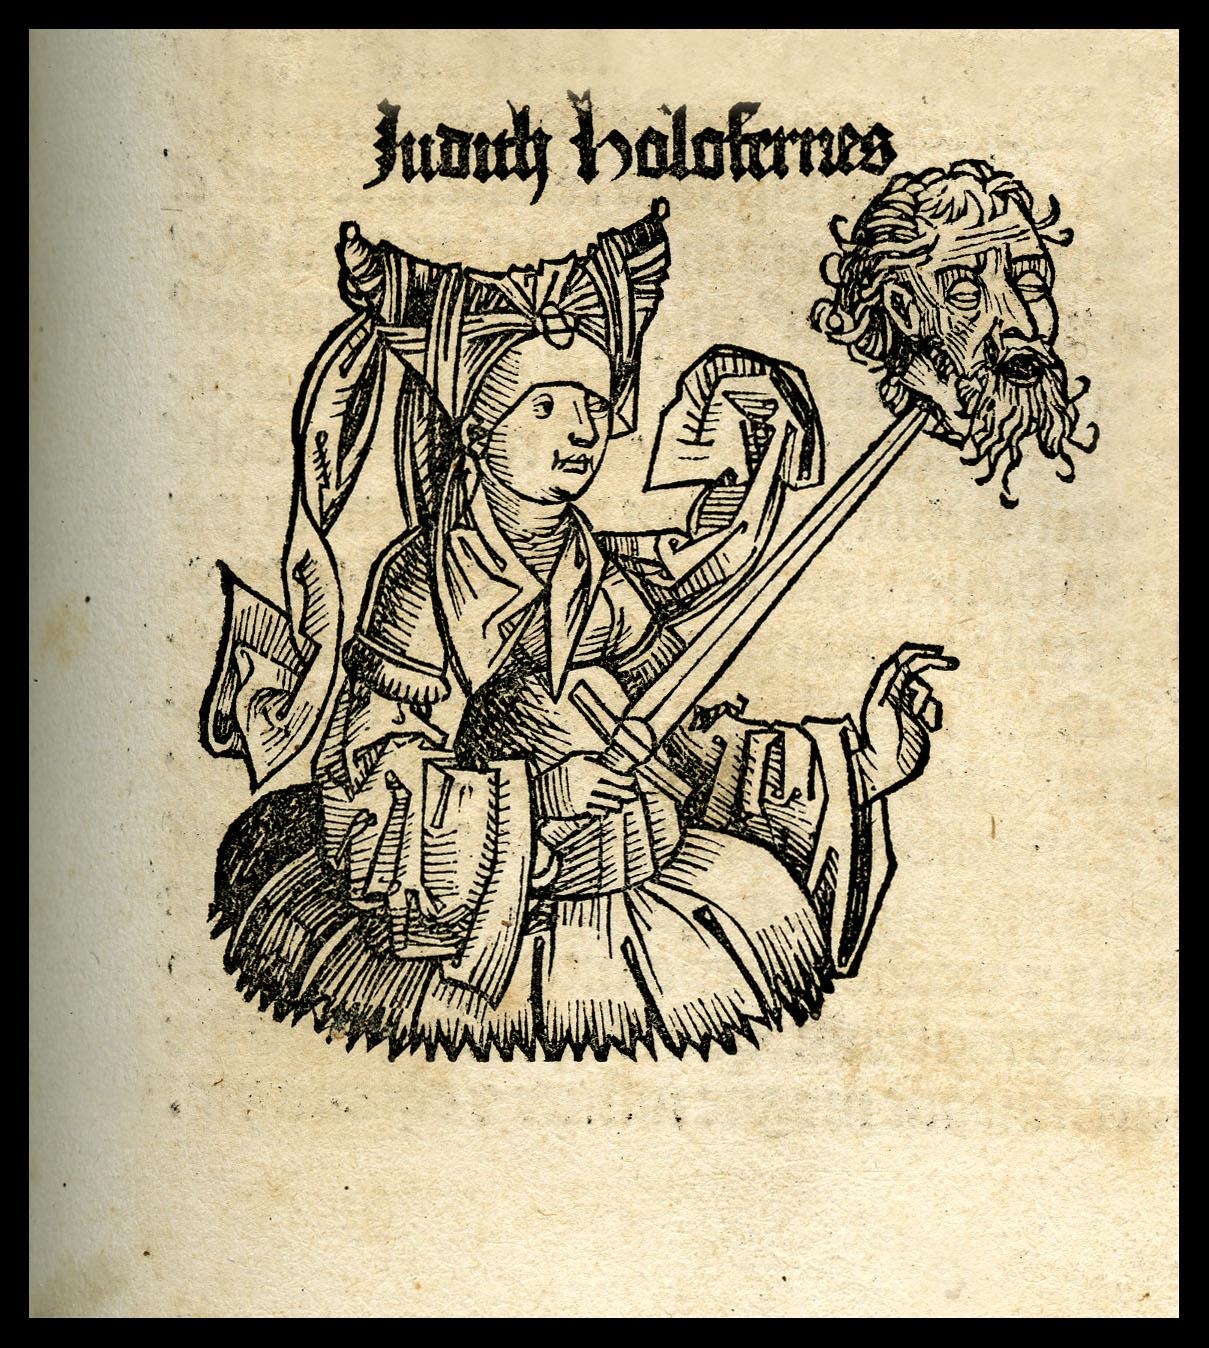 Hartmann Schedel (Norimberga, 1440 - 1514) Liber Chronicarum, Norimberga, Anton Koberger, 1493 Biblioteca del Museo Correr, Fondazione Musei Civici di Venezia